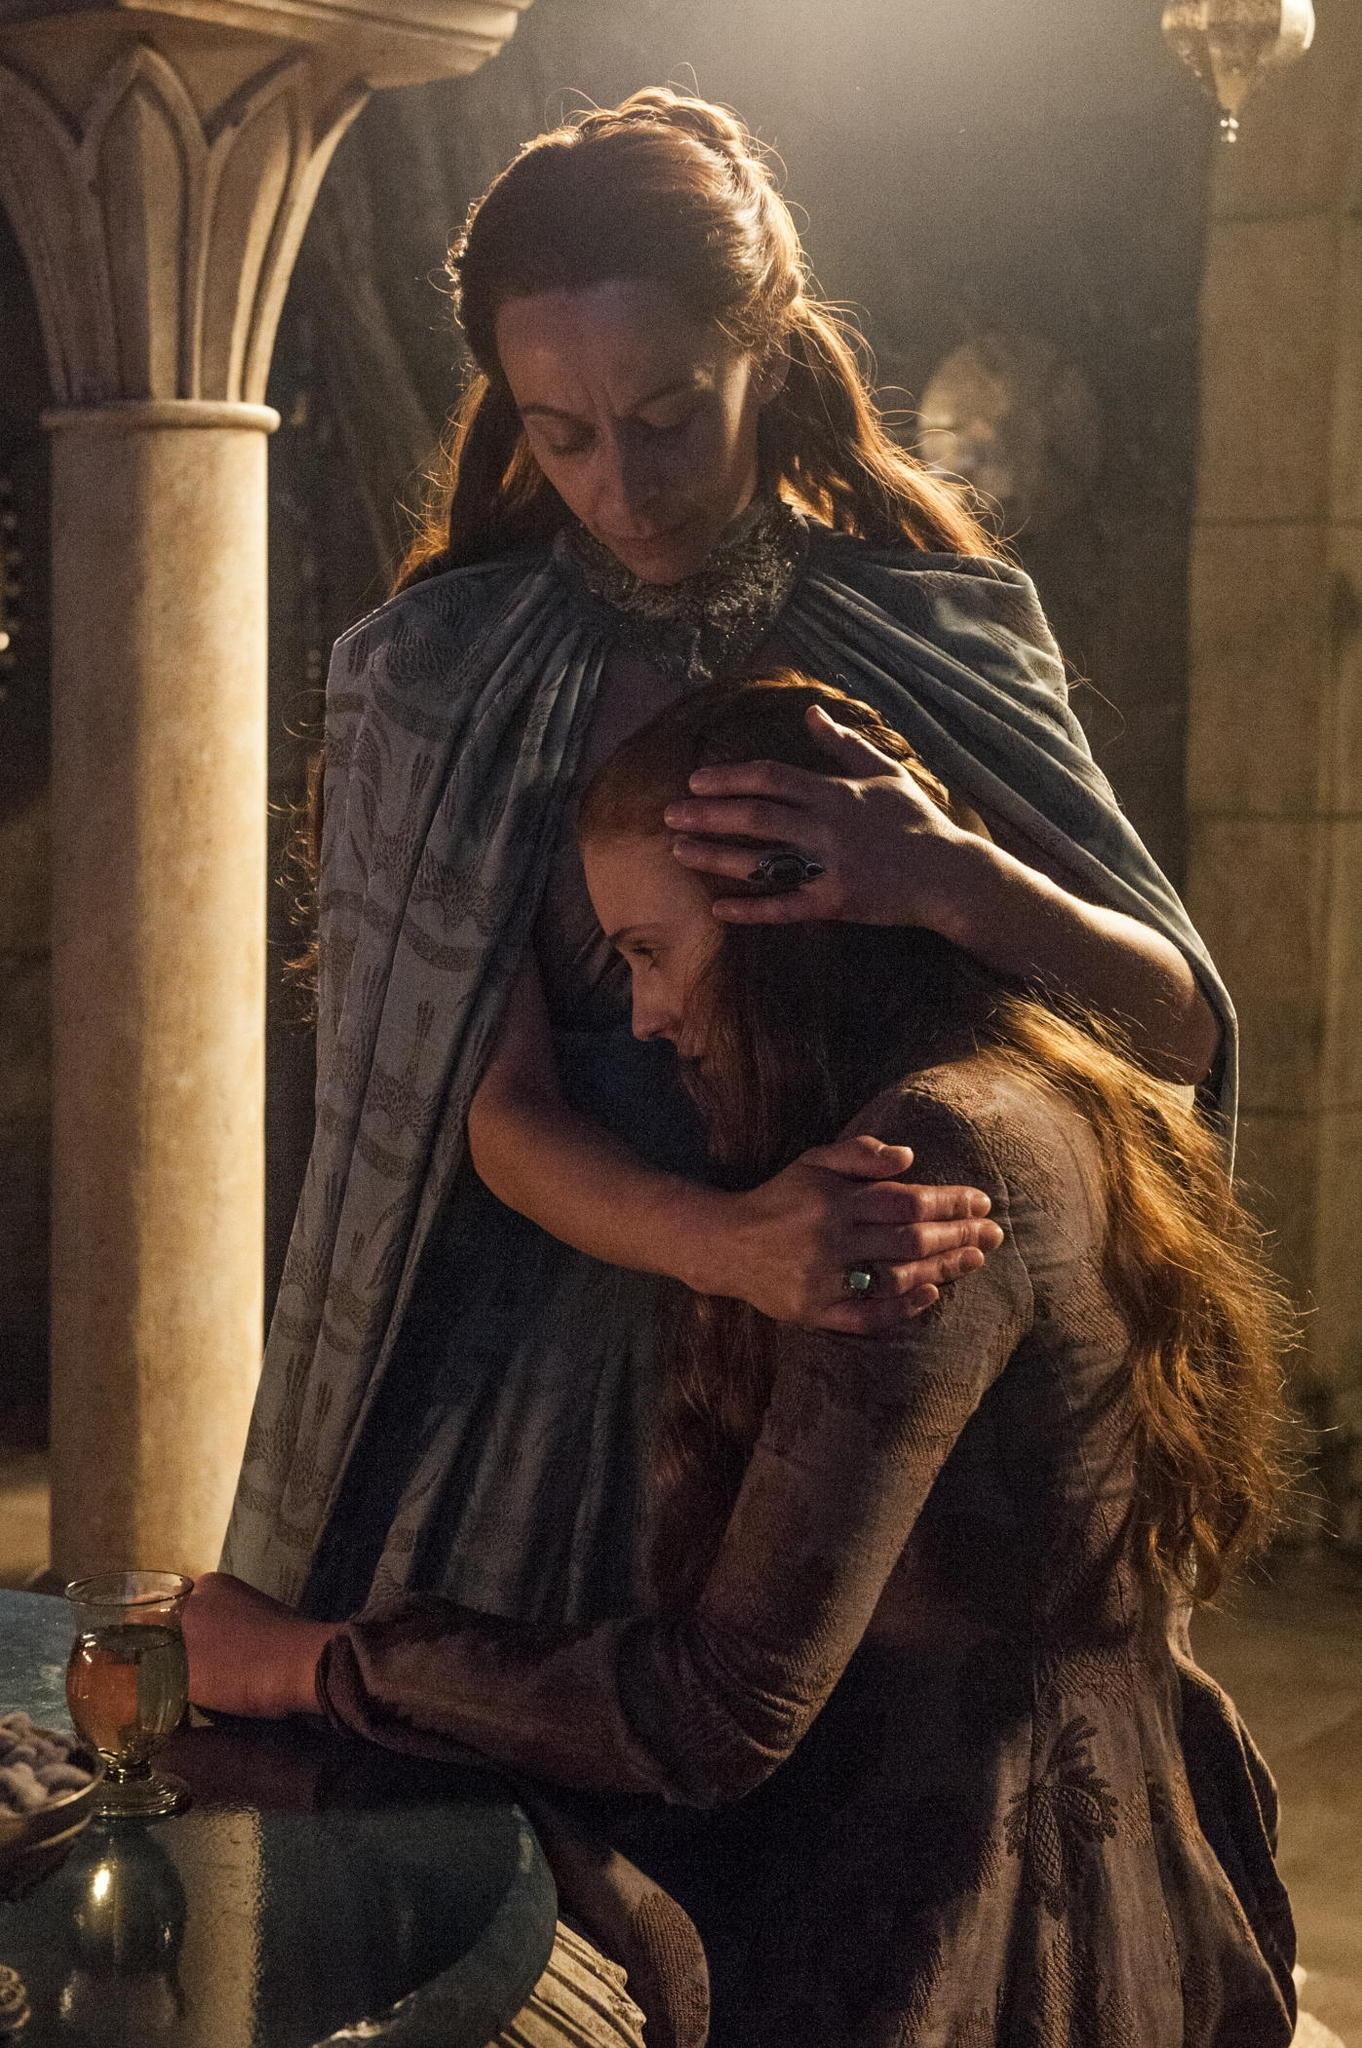 Il trono di spade: Sophie Turner e Kate Dickie nell'episodio First of His Name, quarta stagione